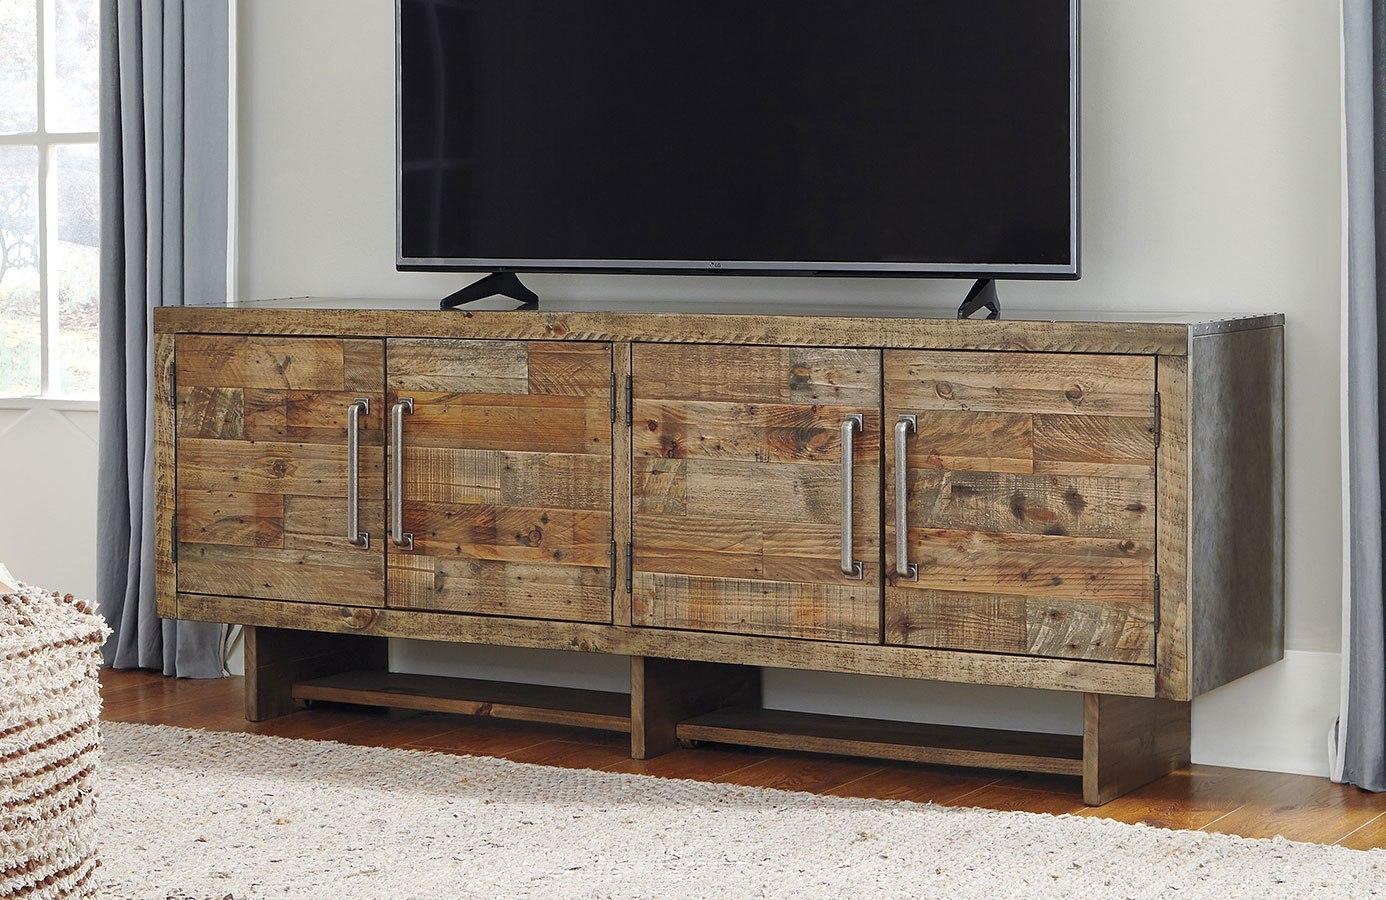 Mozanburg Extra Large Tv Stand By Signature Design Ashley Furniturepick